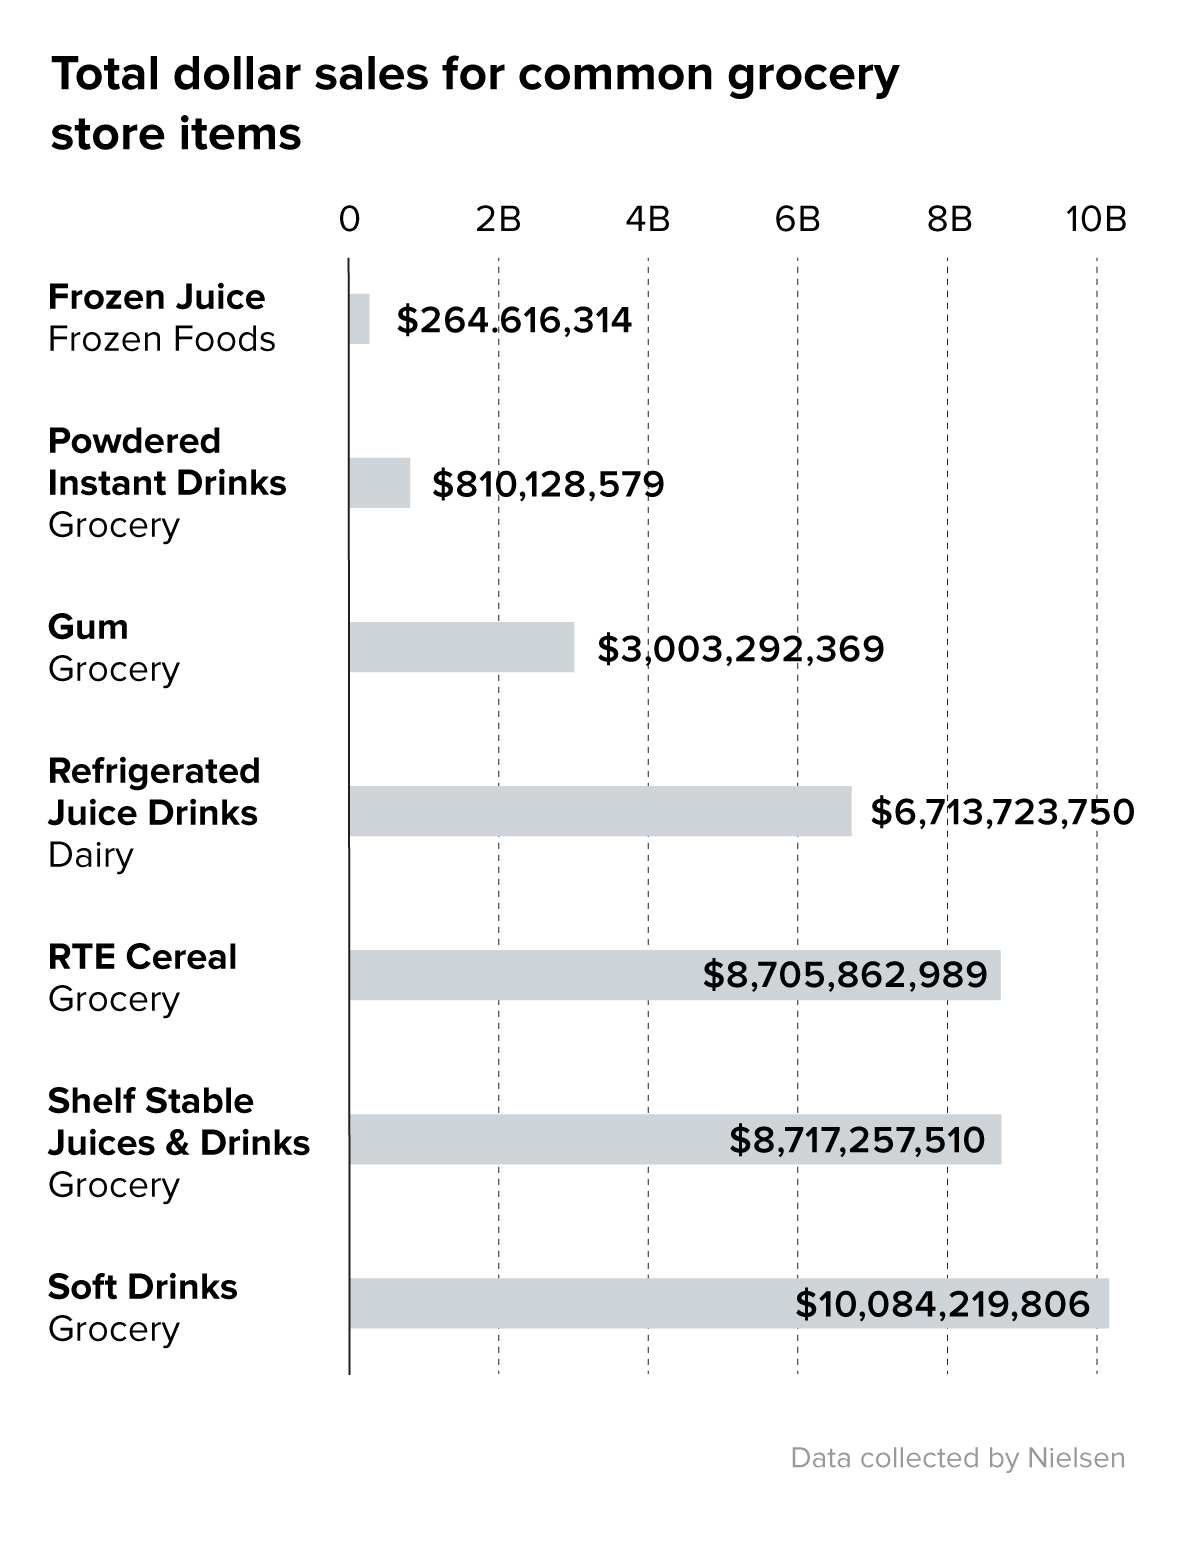 Food and beverage categories by total sales